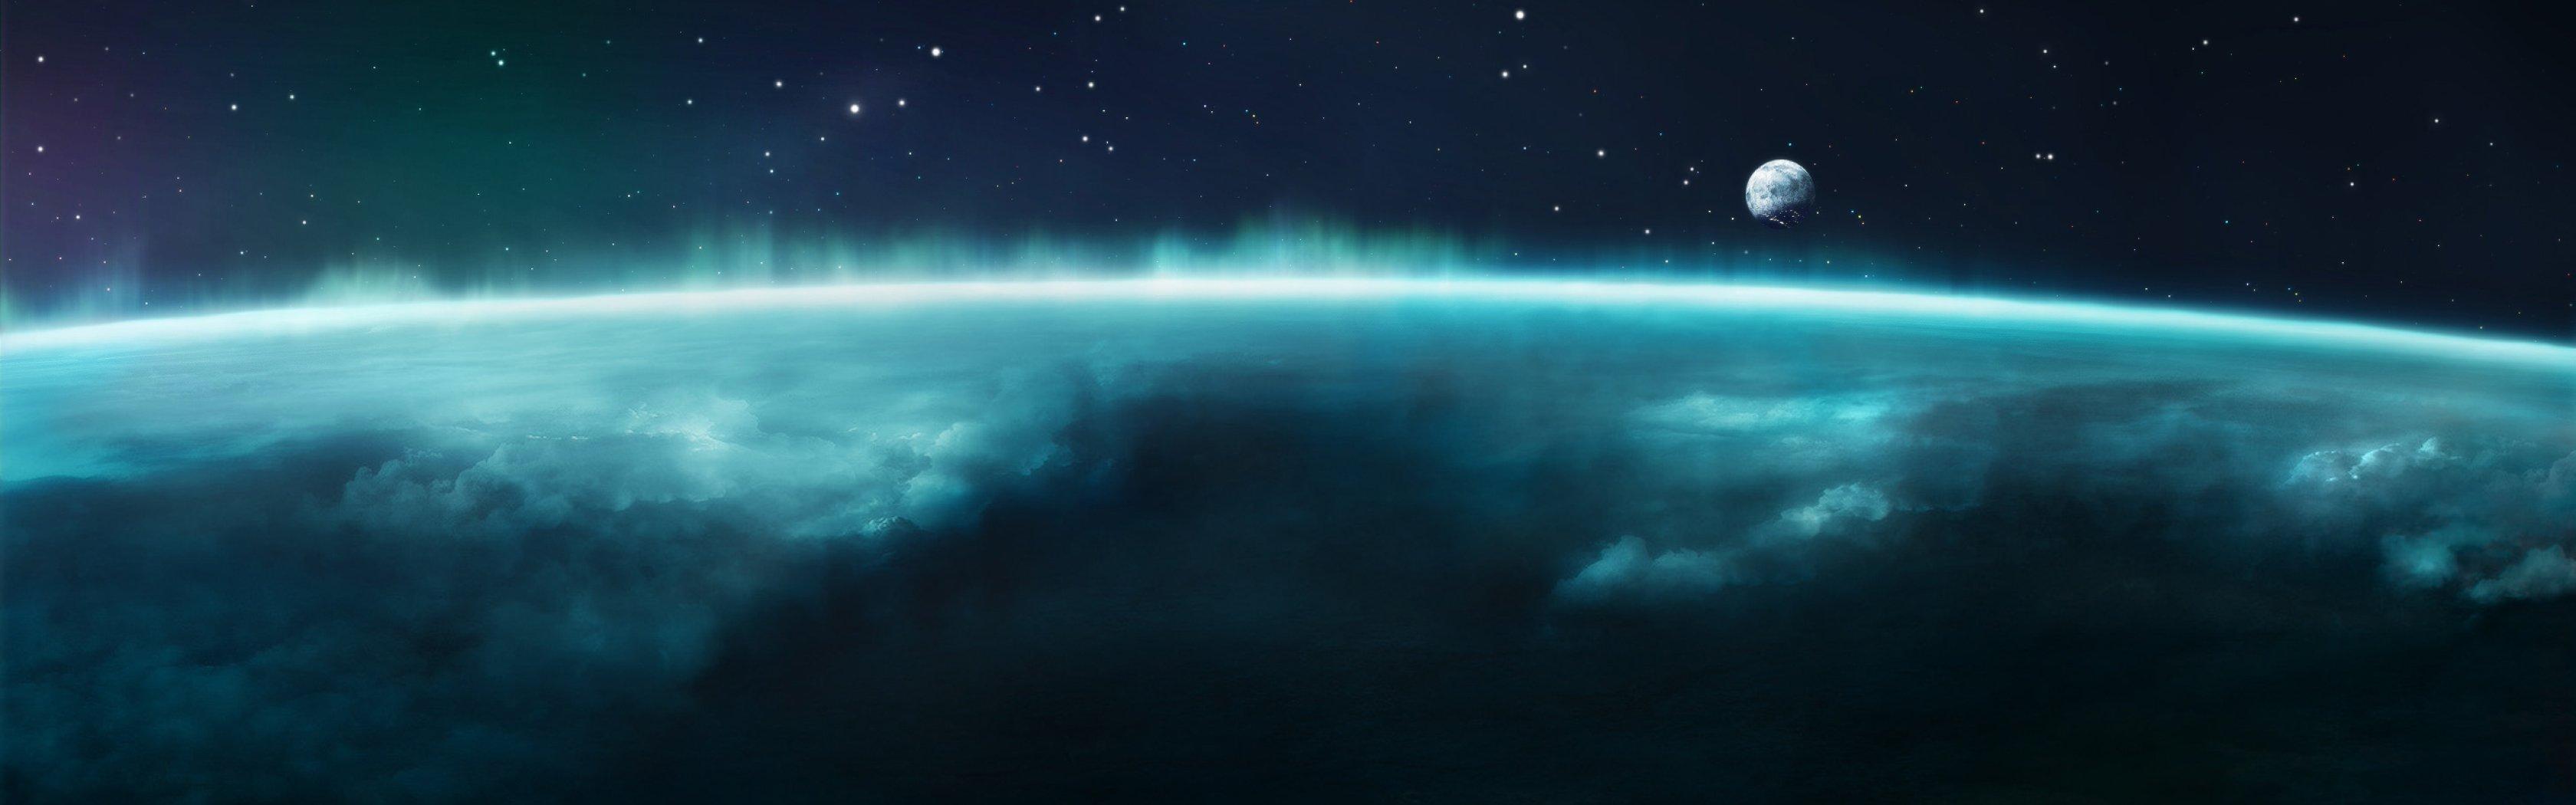 Outer space planets aurora borealis wallpaper | 3360x1050 ...